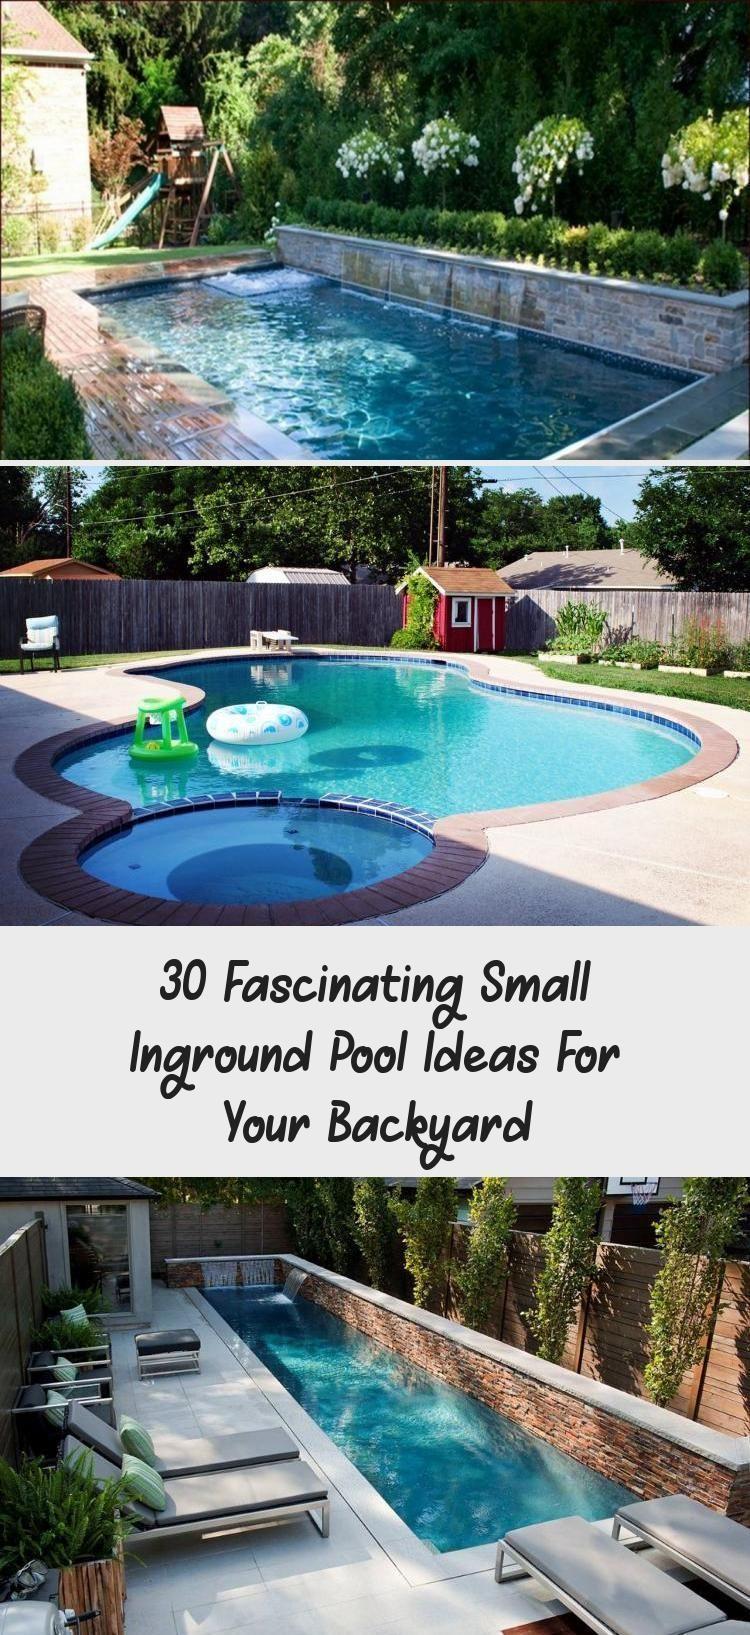 30 Fascinating Little Inground Pool Ideas For Your Garden Home Design Desi Desi Design Fasci Small Backyard Design Small Inground Pool Inground Pools